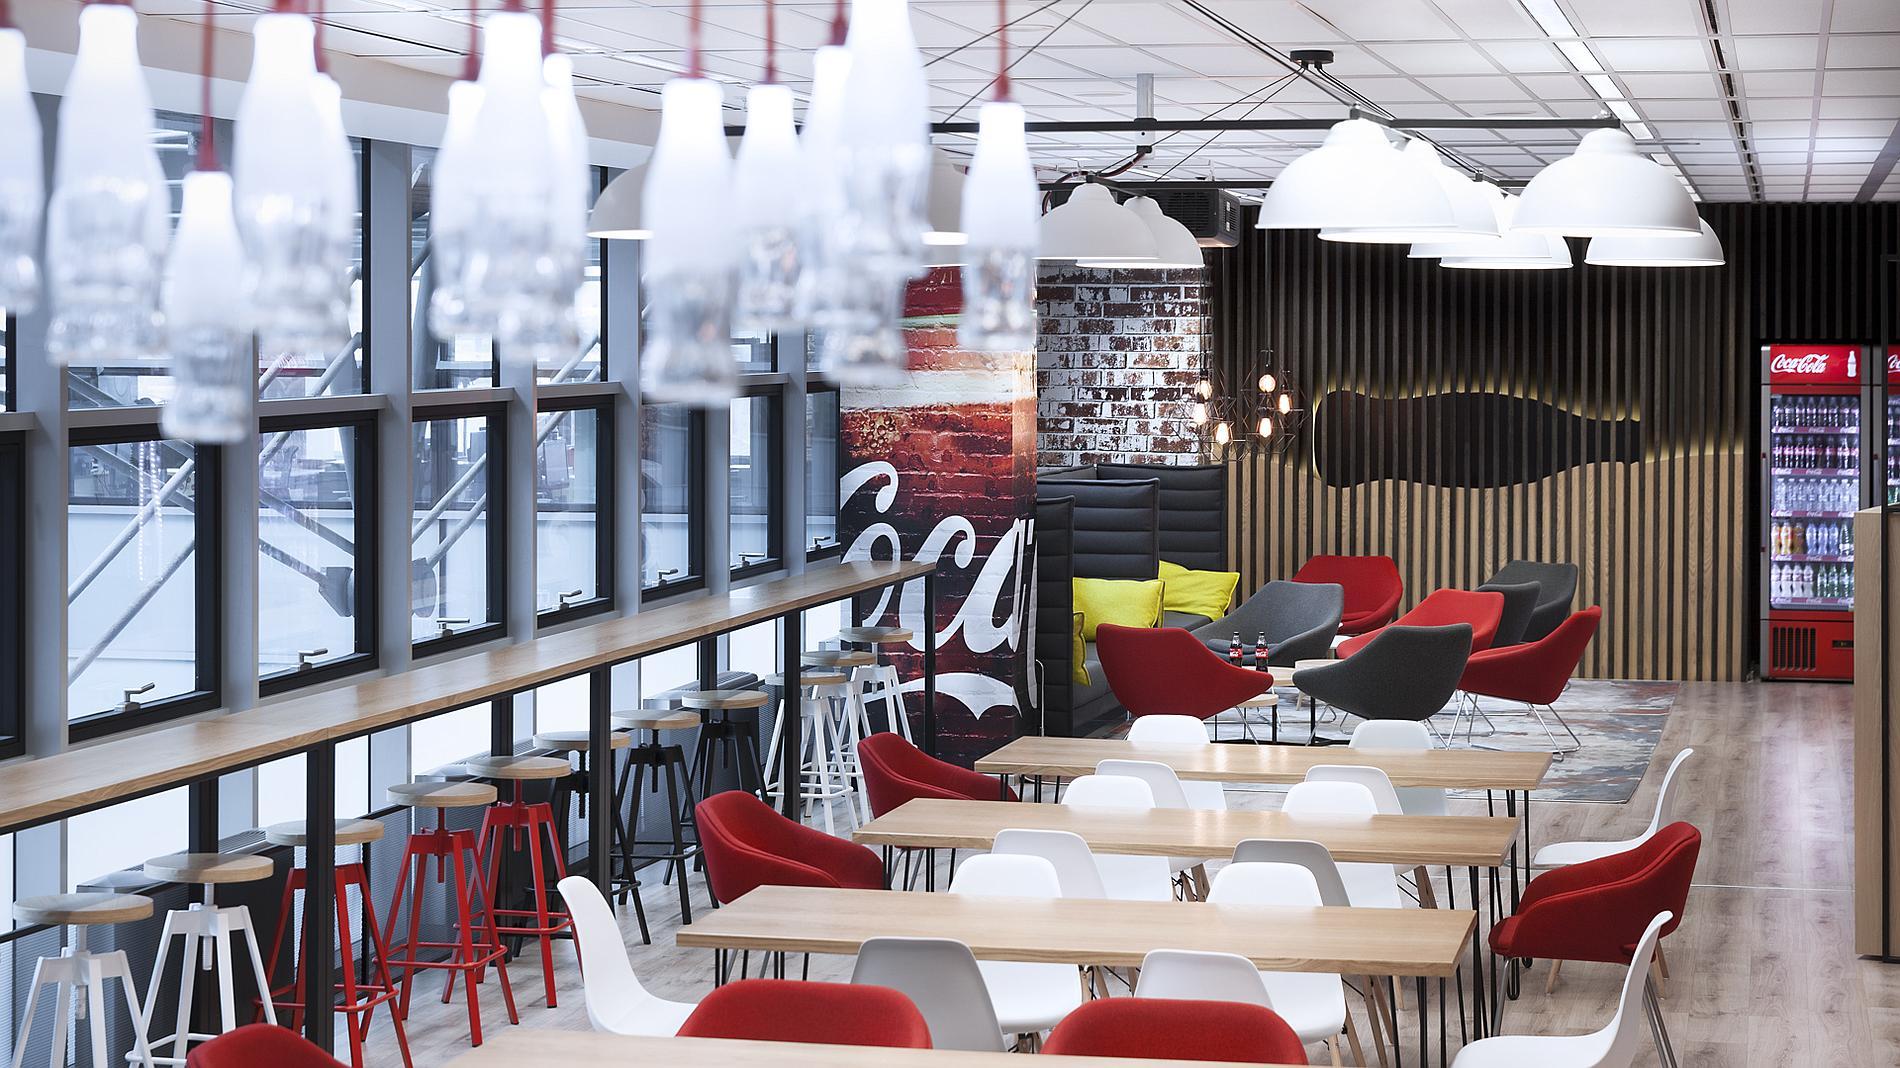 Coca-Cola interior design and branding, custom made lighting, wood wall, Coca-Cola bottle